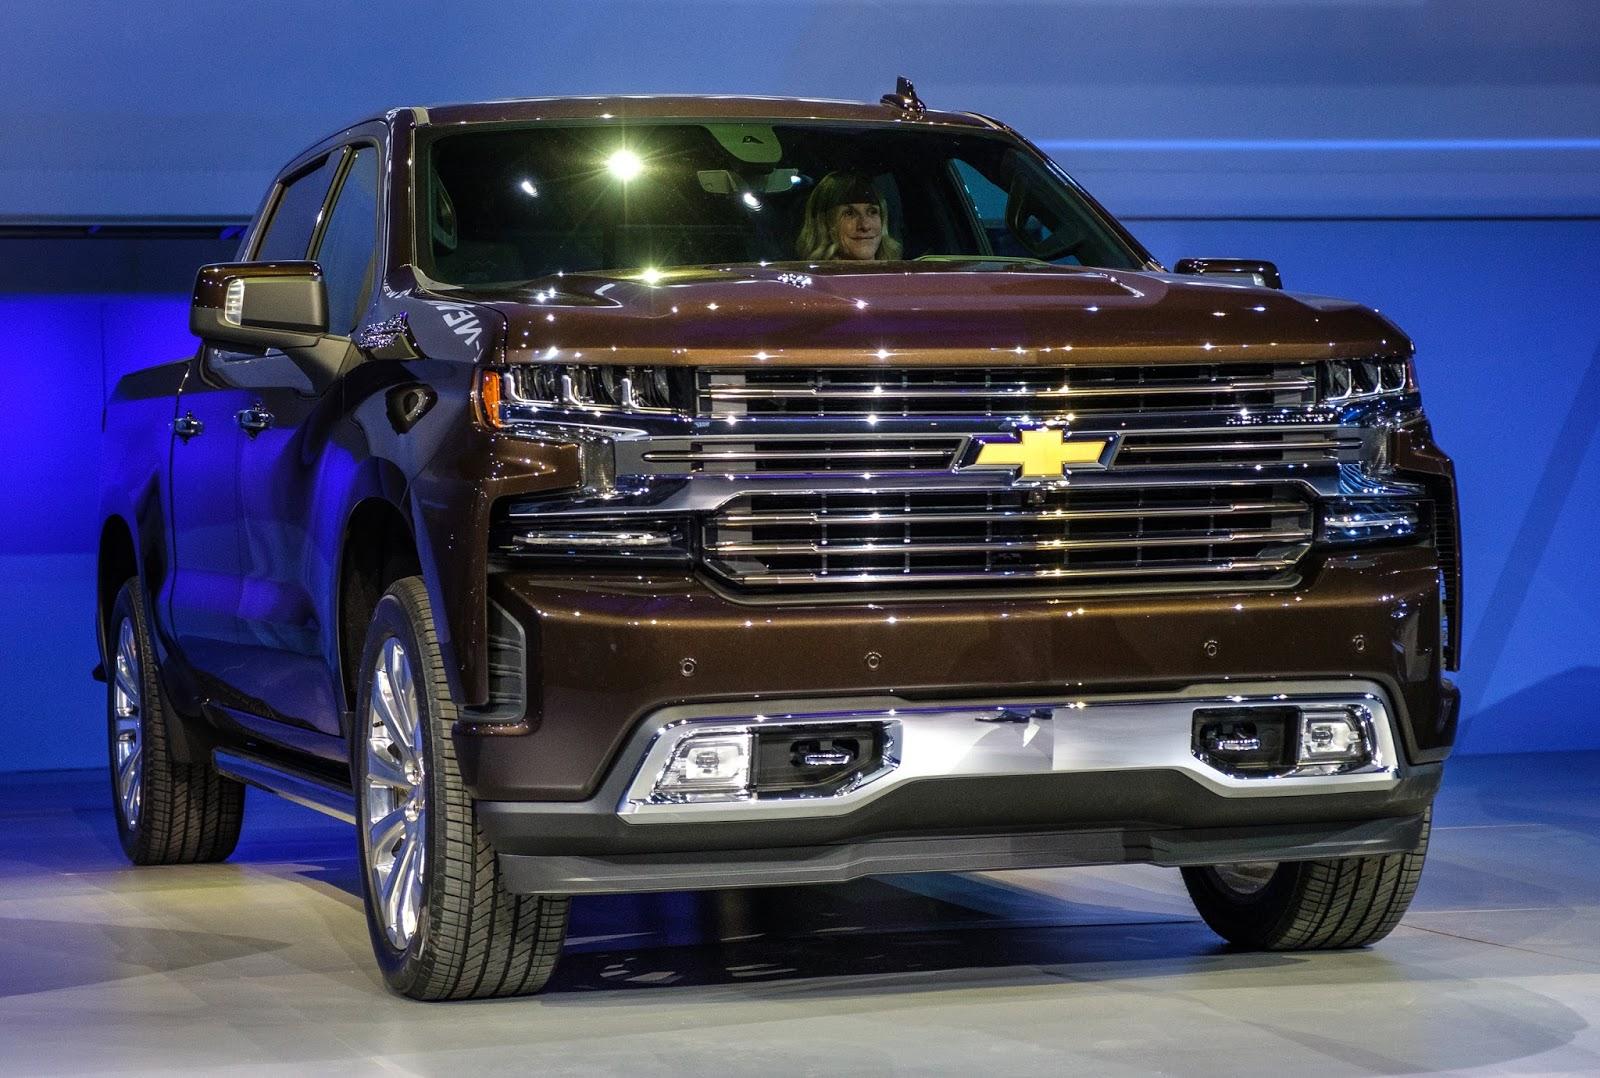 2019 Chevrolet Silverado, le diesel produit dans le Michigan